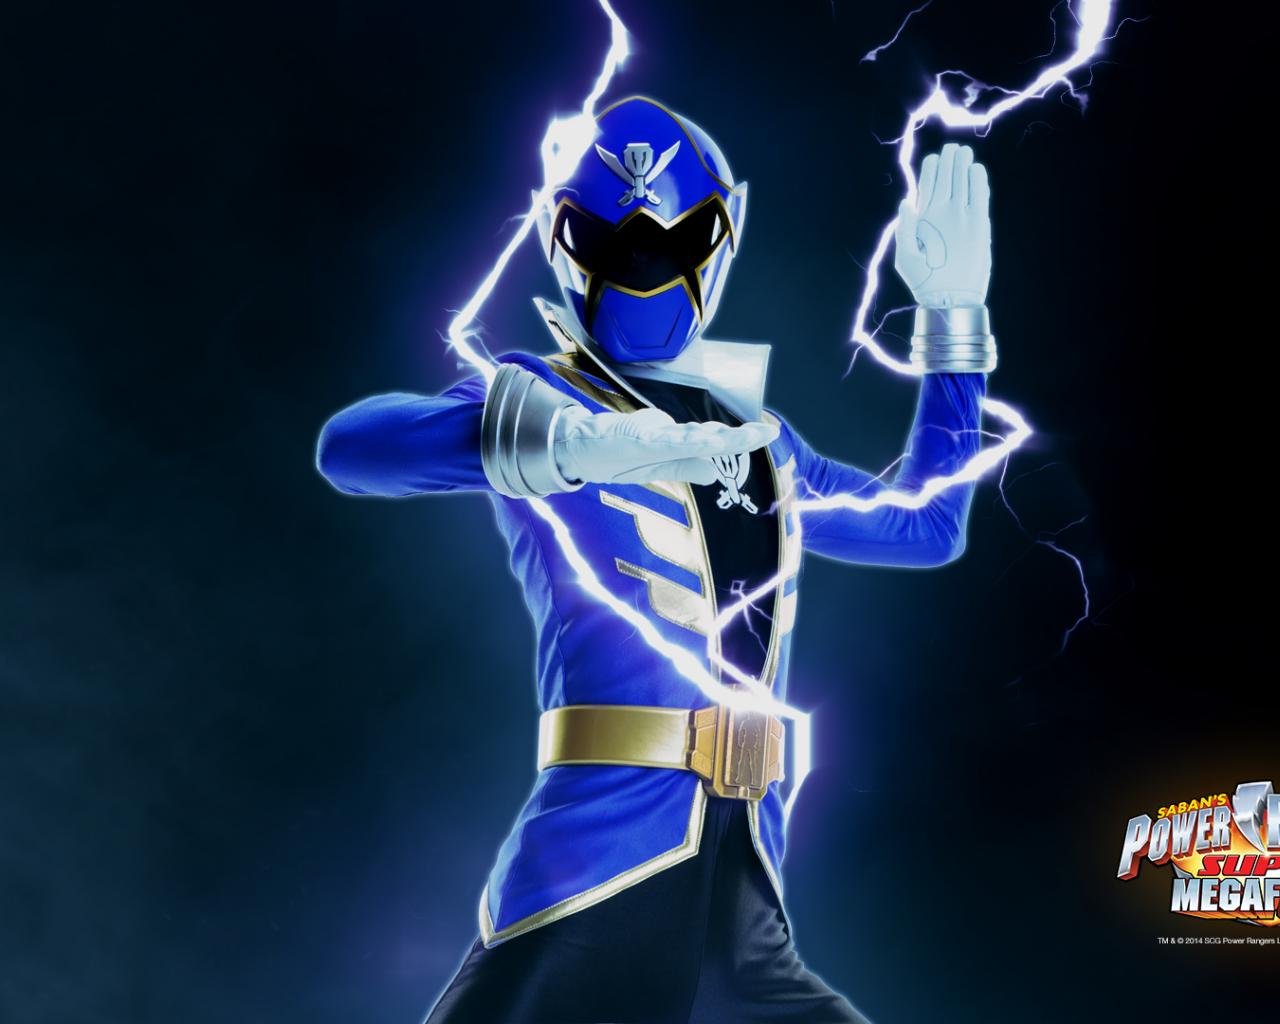 Free Download Power Rangers Wallpaper Super Megaforce Blue Fun